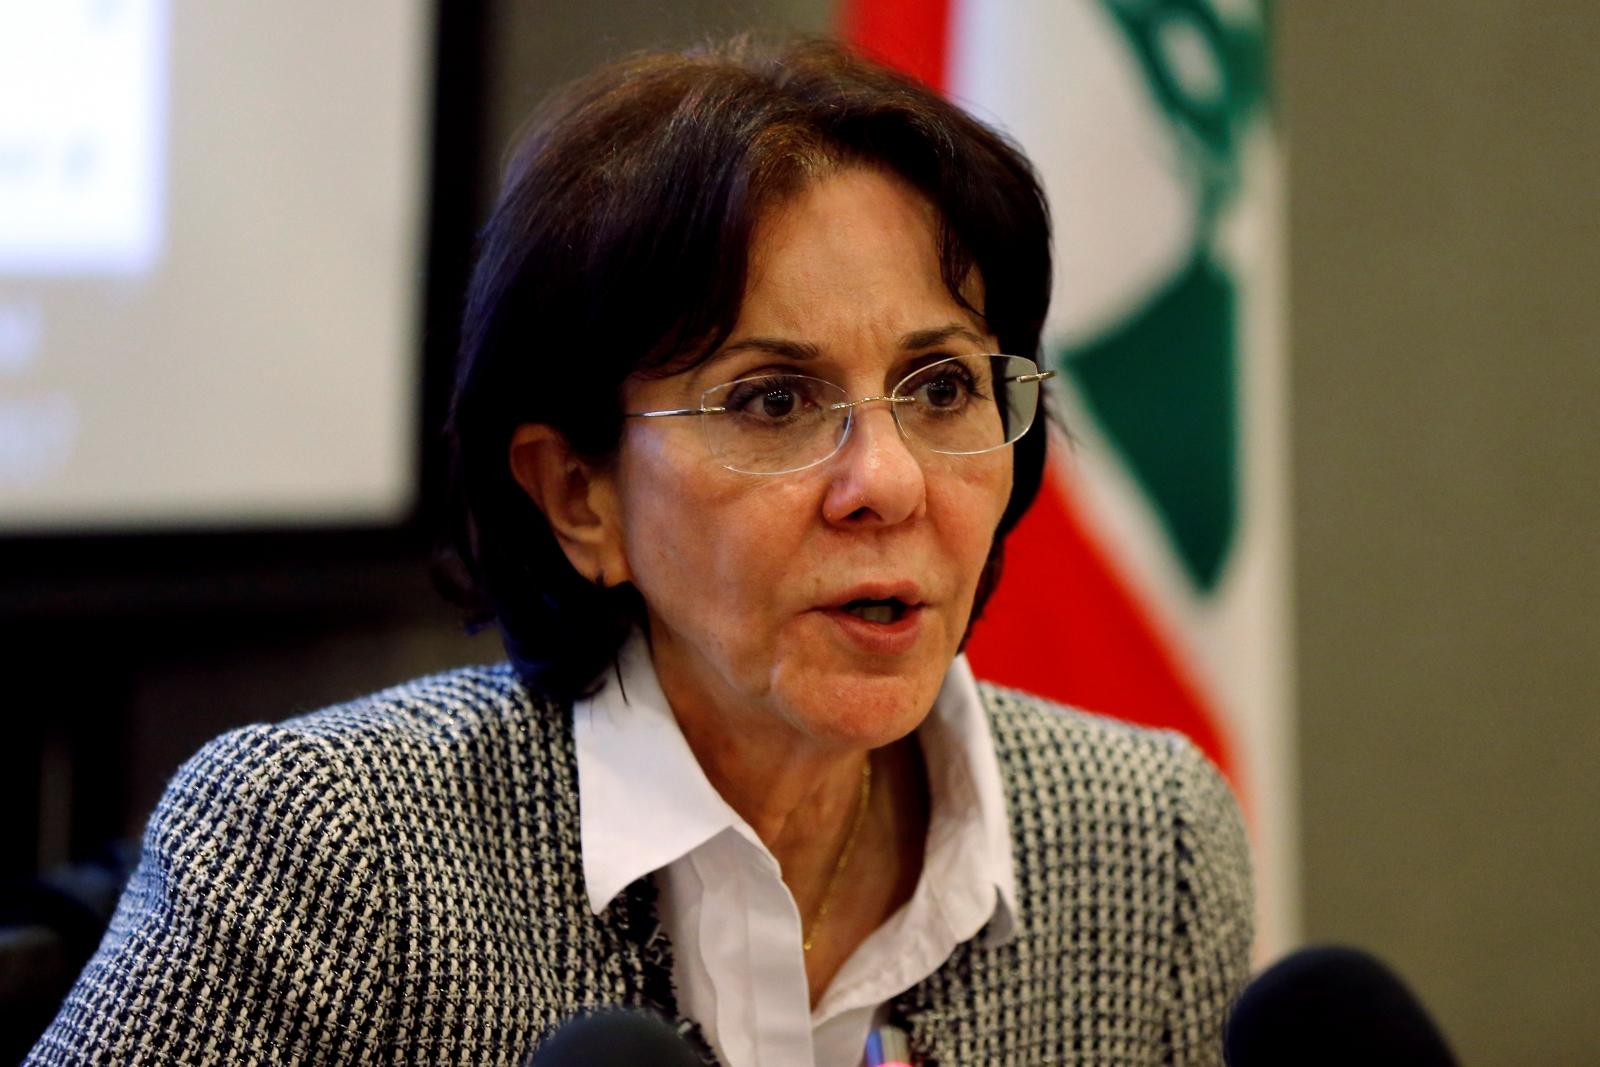 ESCWA Executive Secretary Rima Khalaf